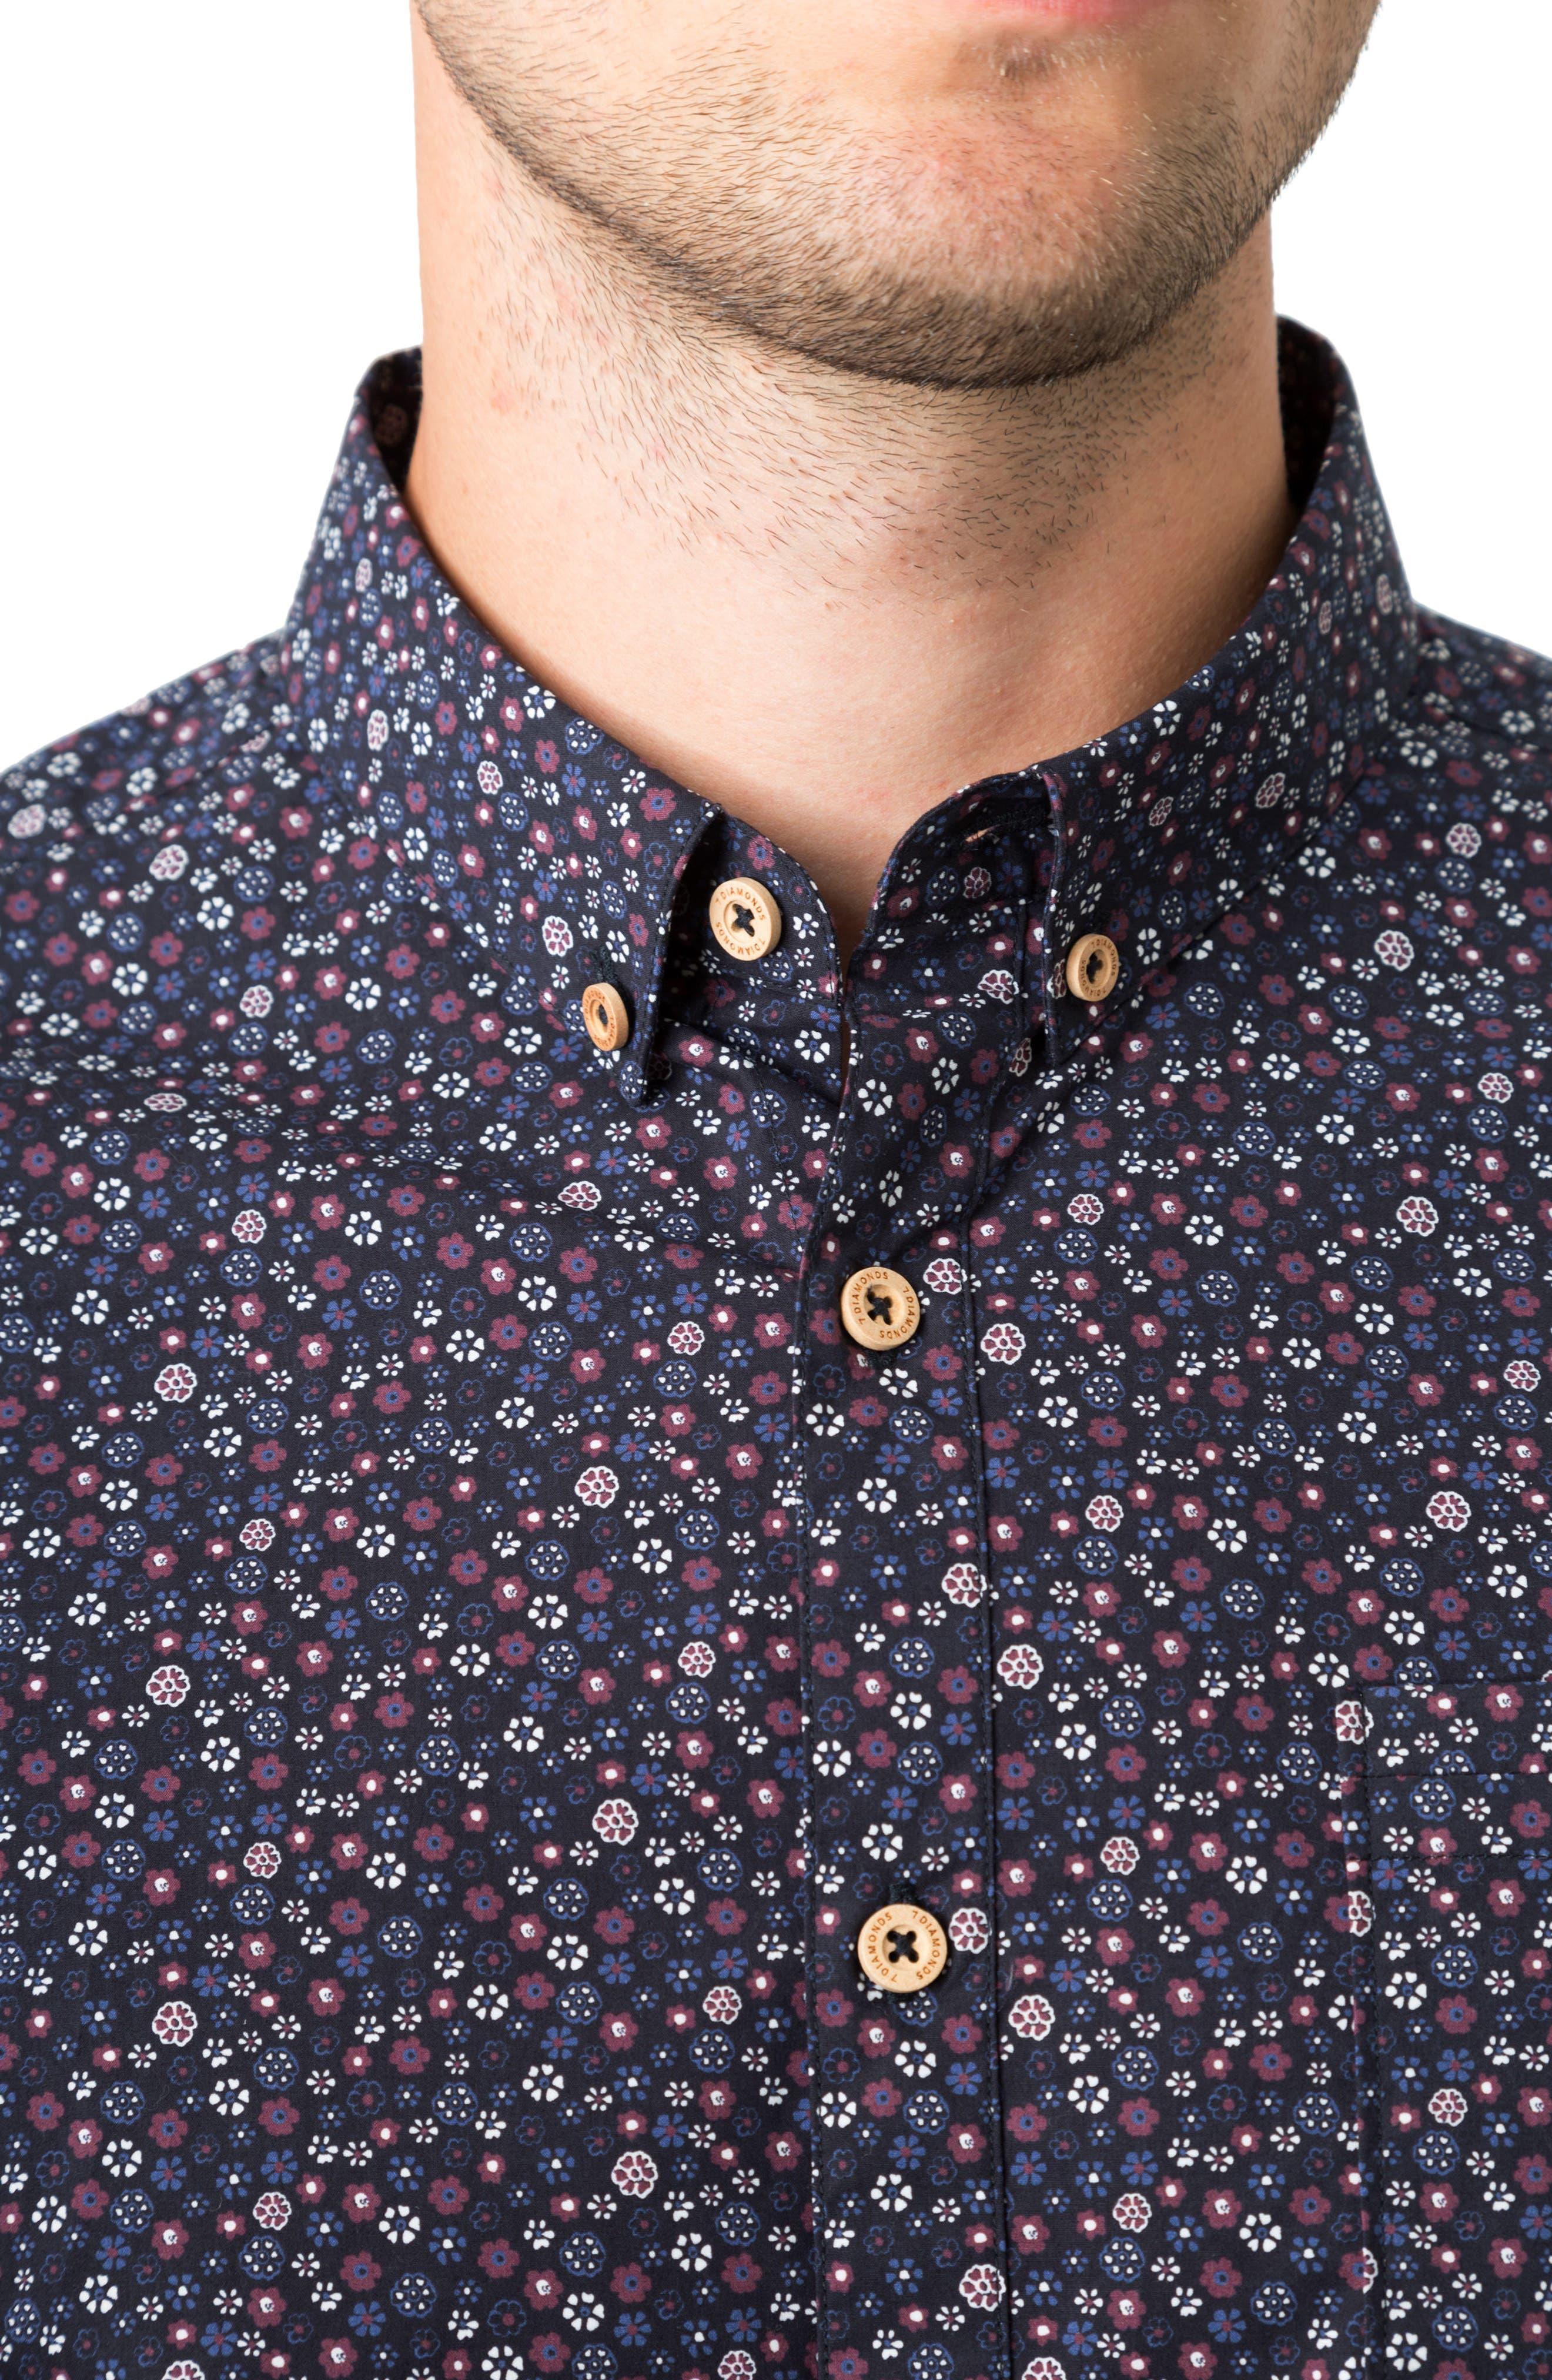 Pure Luck Woven Shirt,                             Alternate thumbnail 4, color,